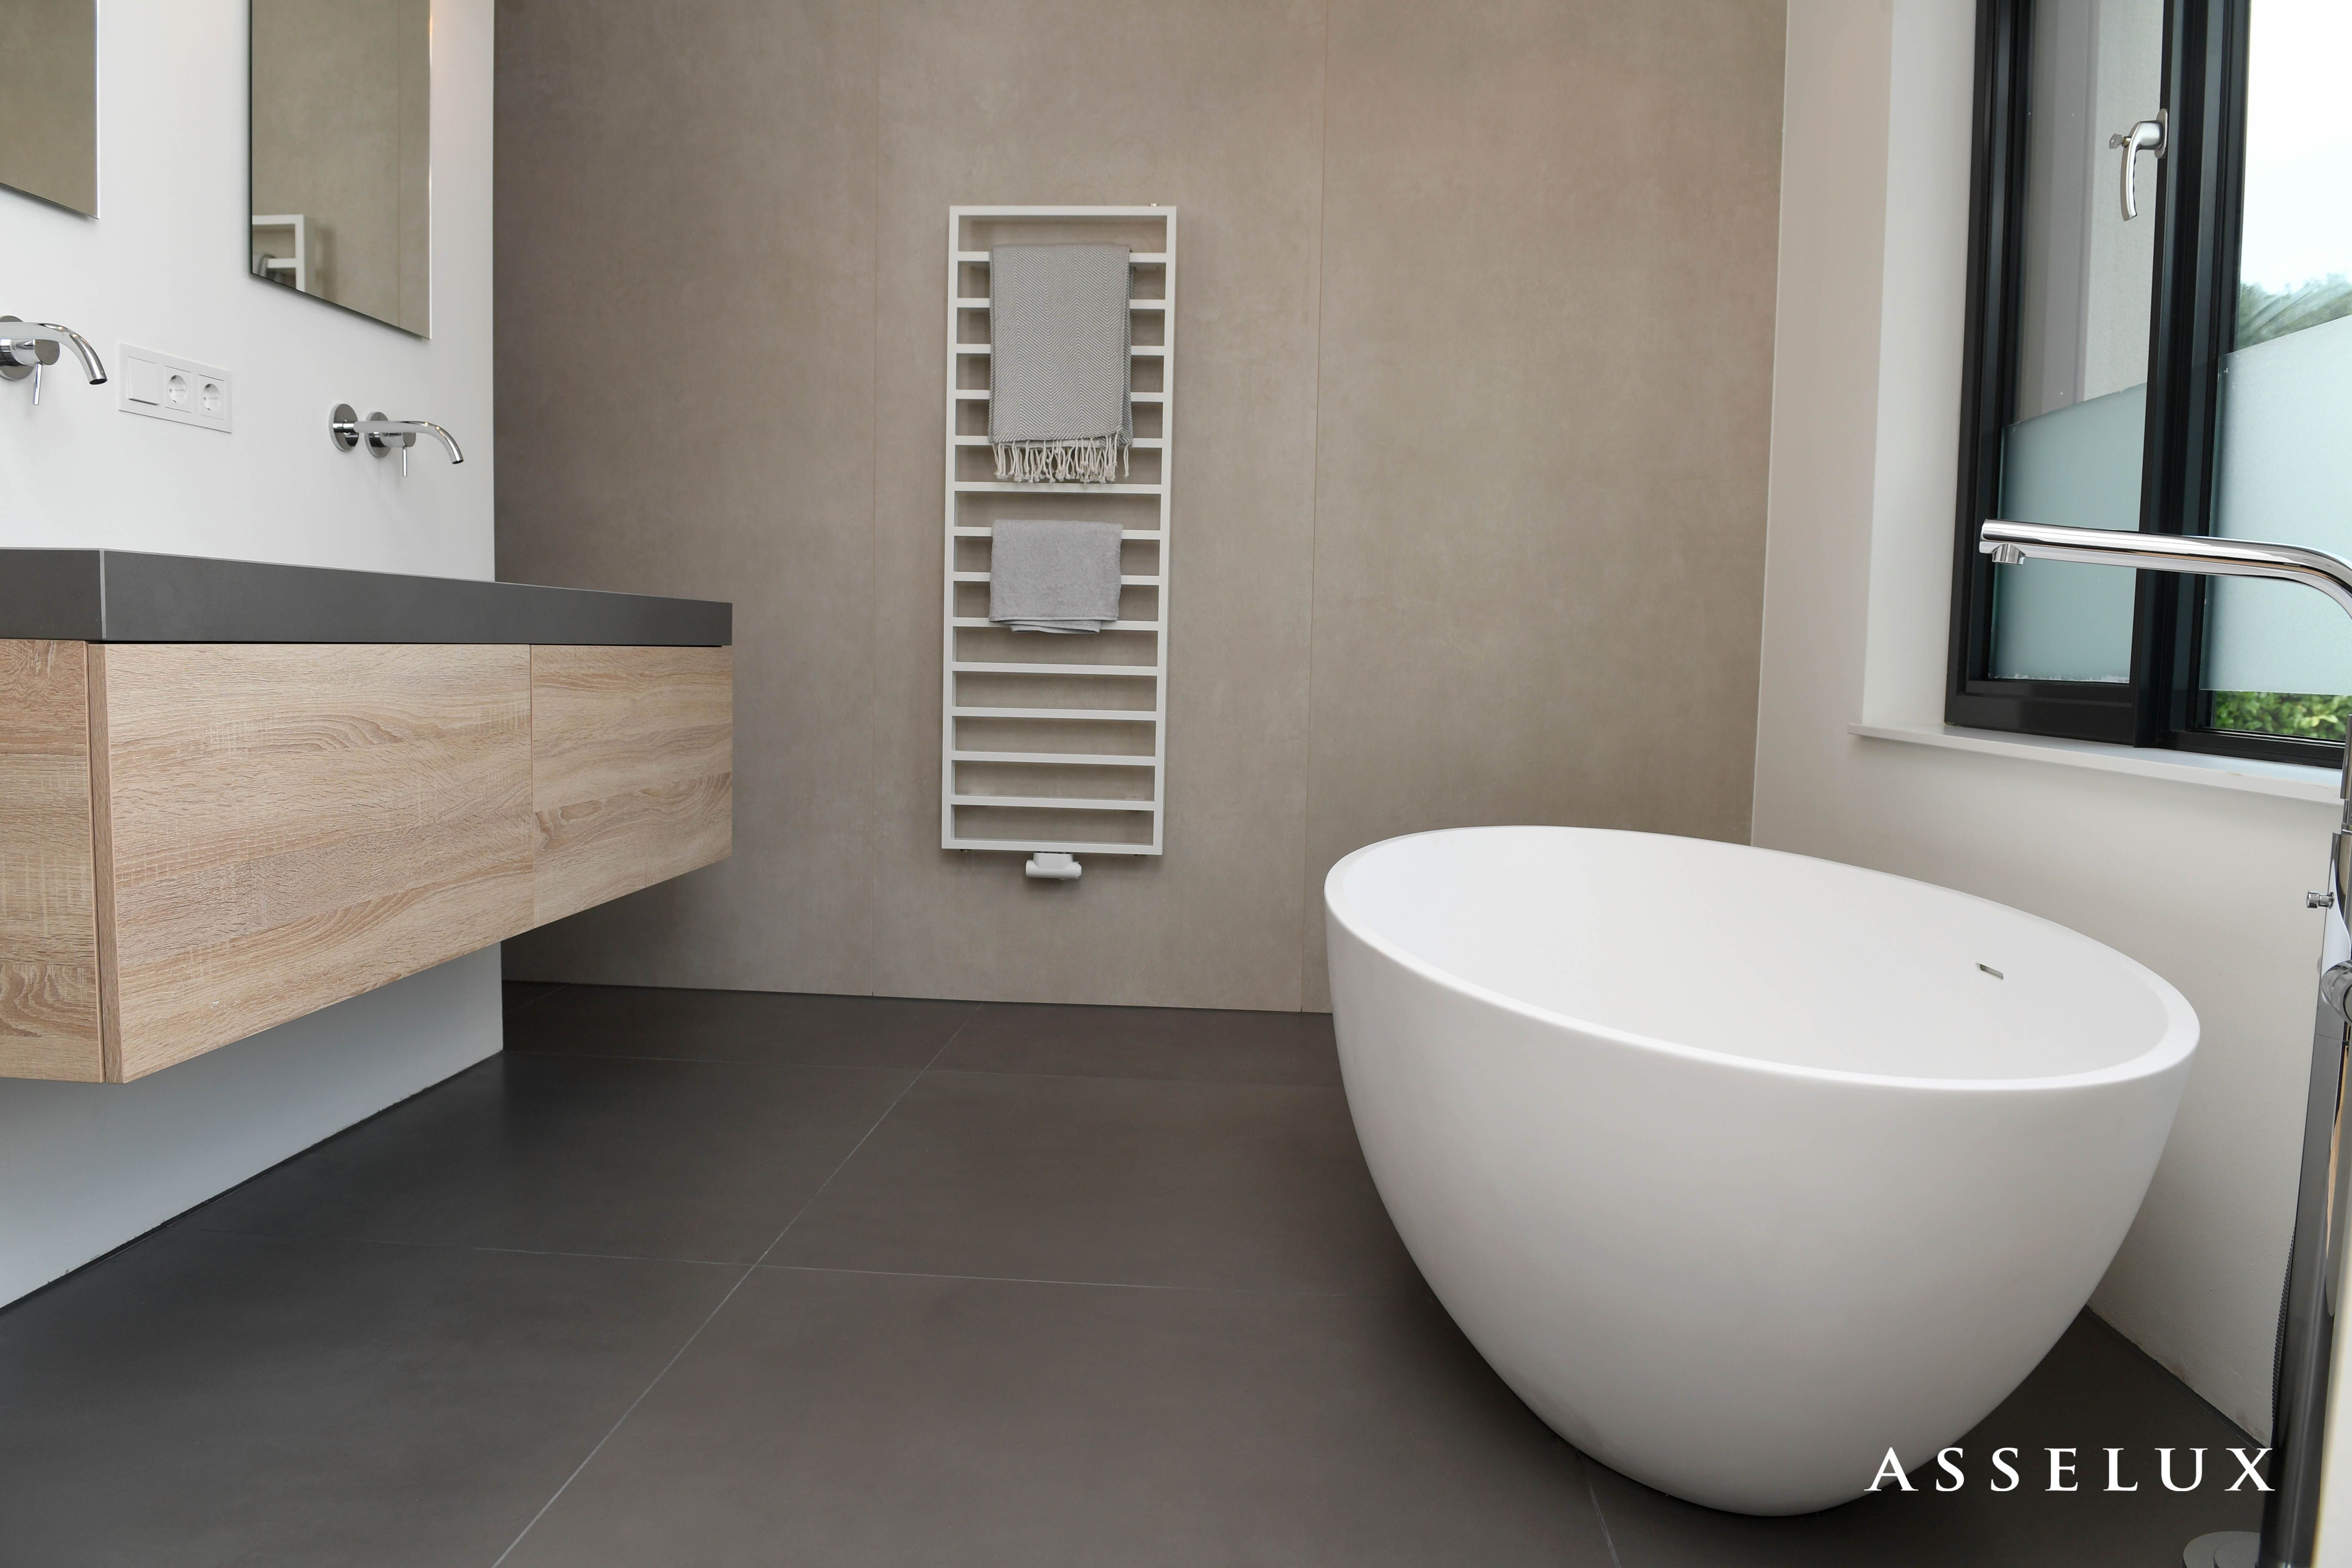 asselux badkamer keramische vloer en wandbekleding wastafel